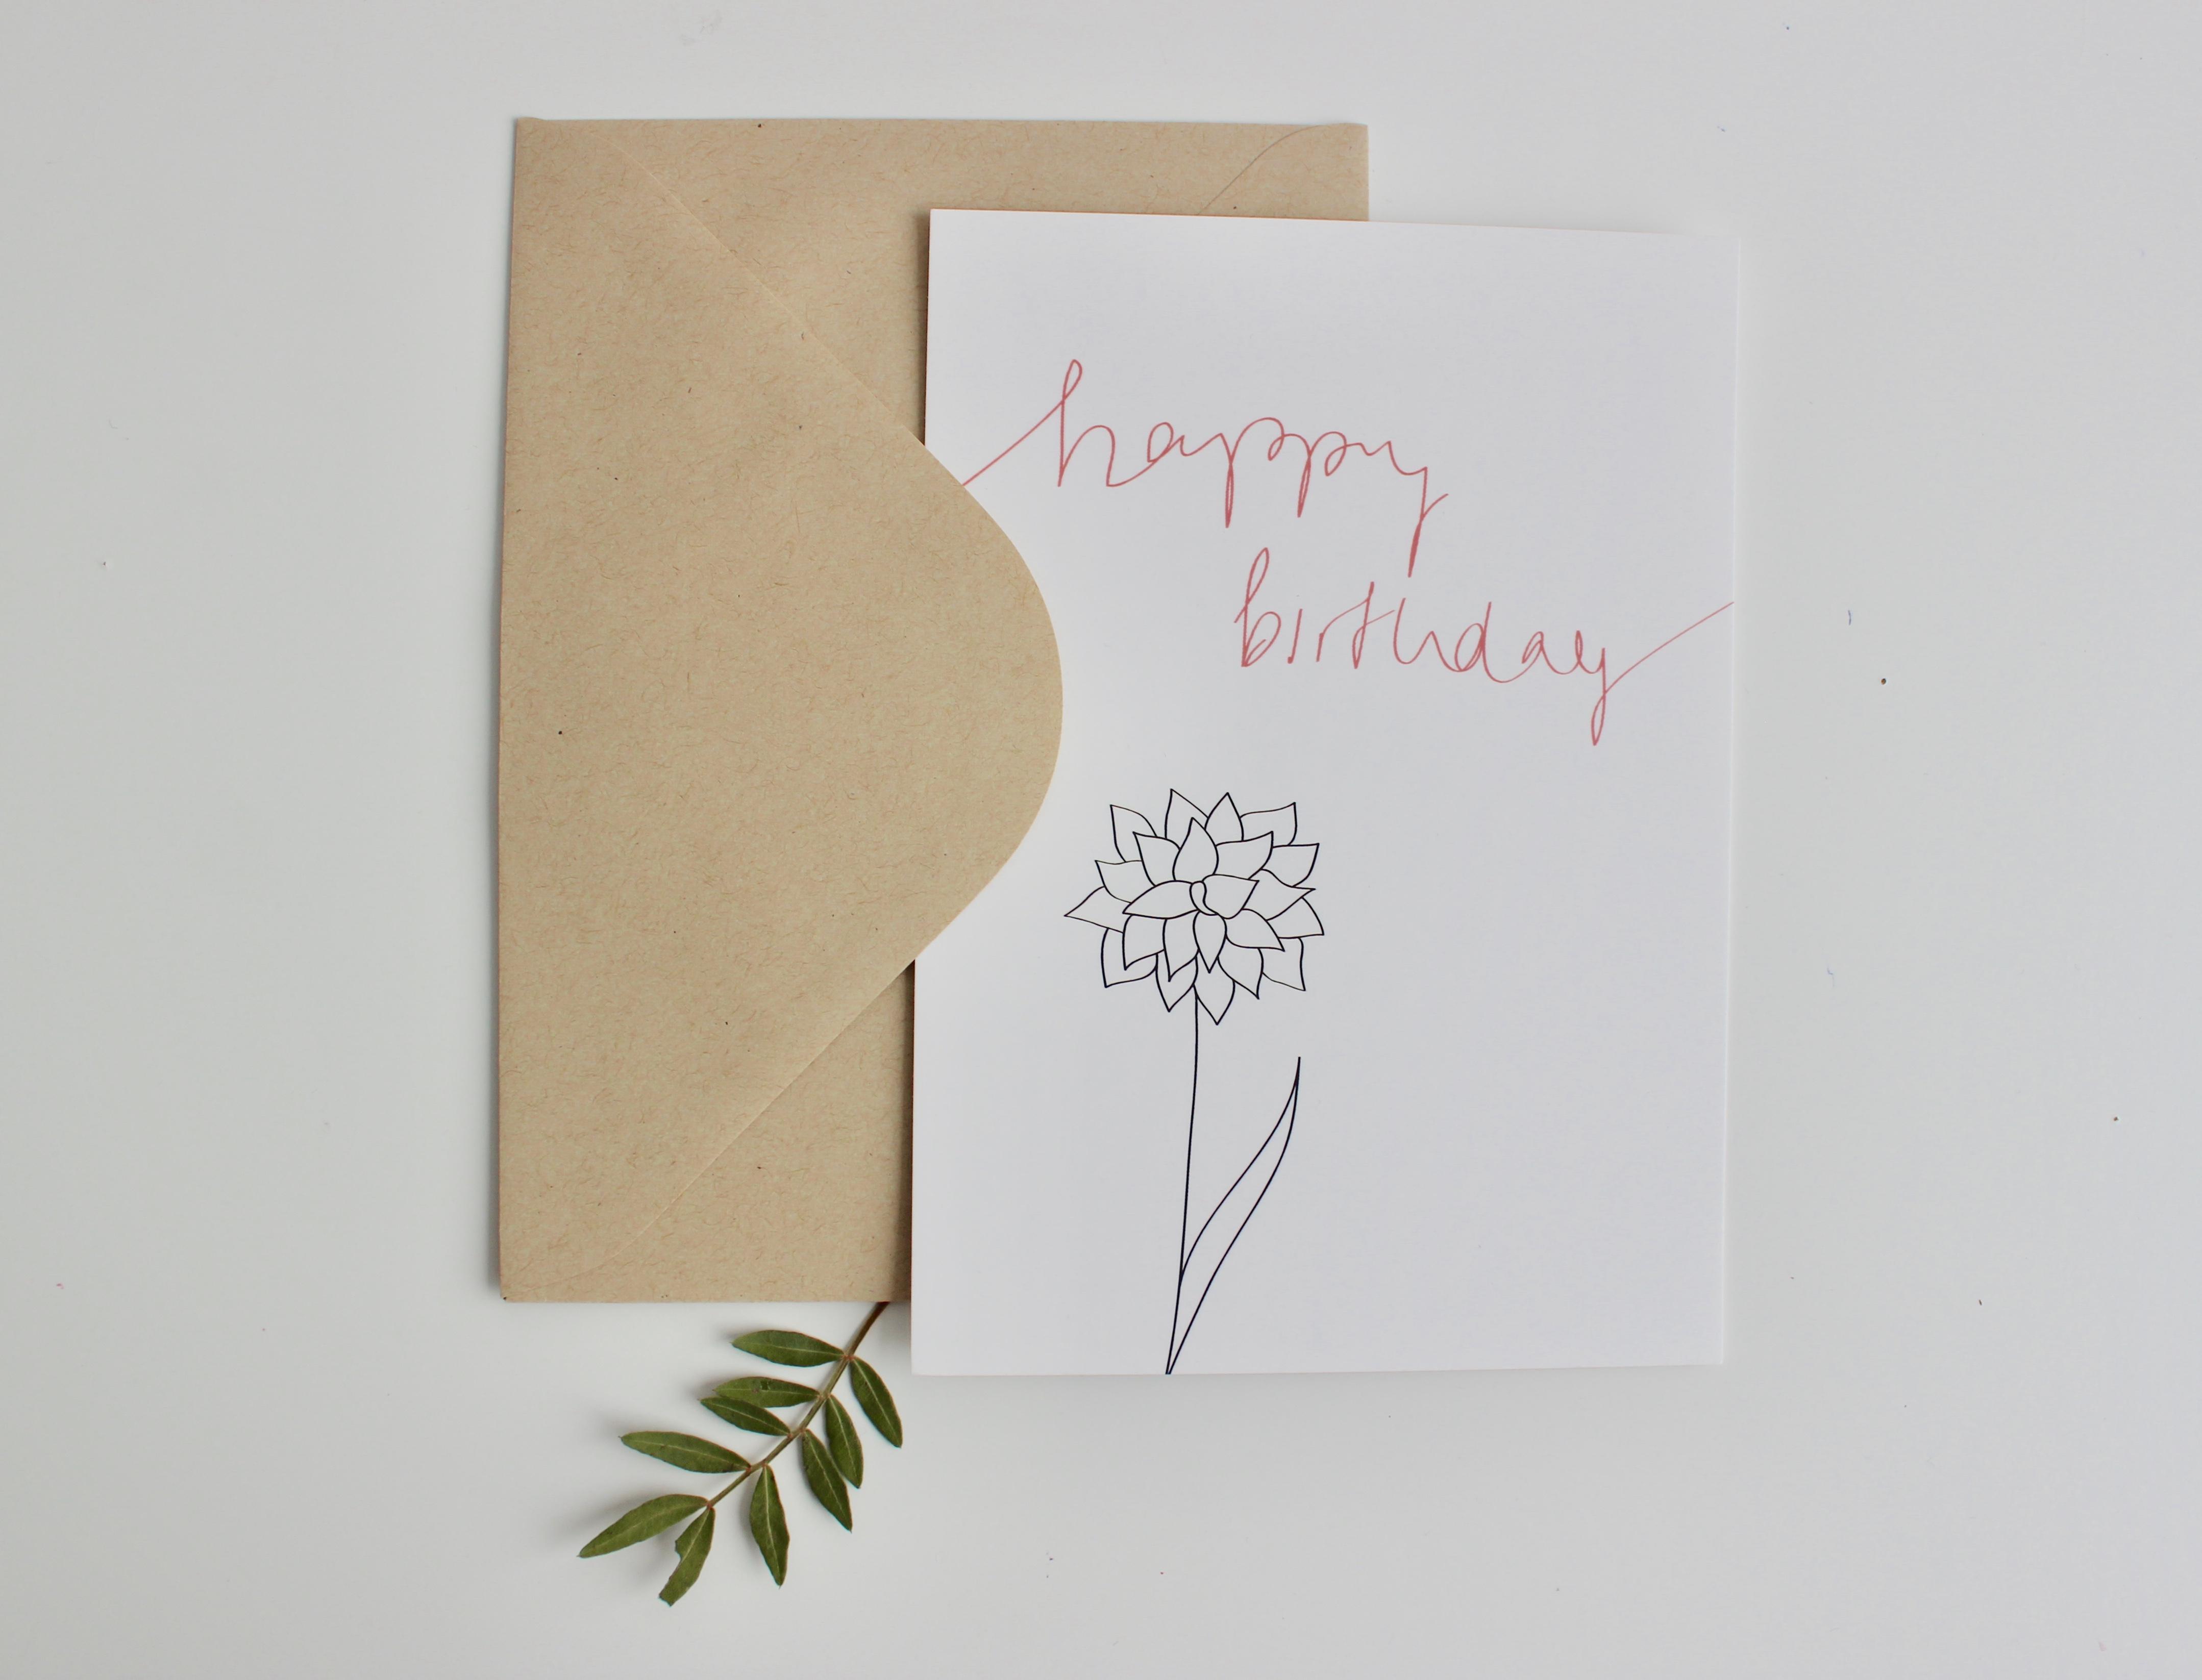 HAPPY BIRTHDAY CARD ROSE O WALDPAPIER